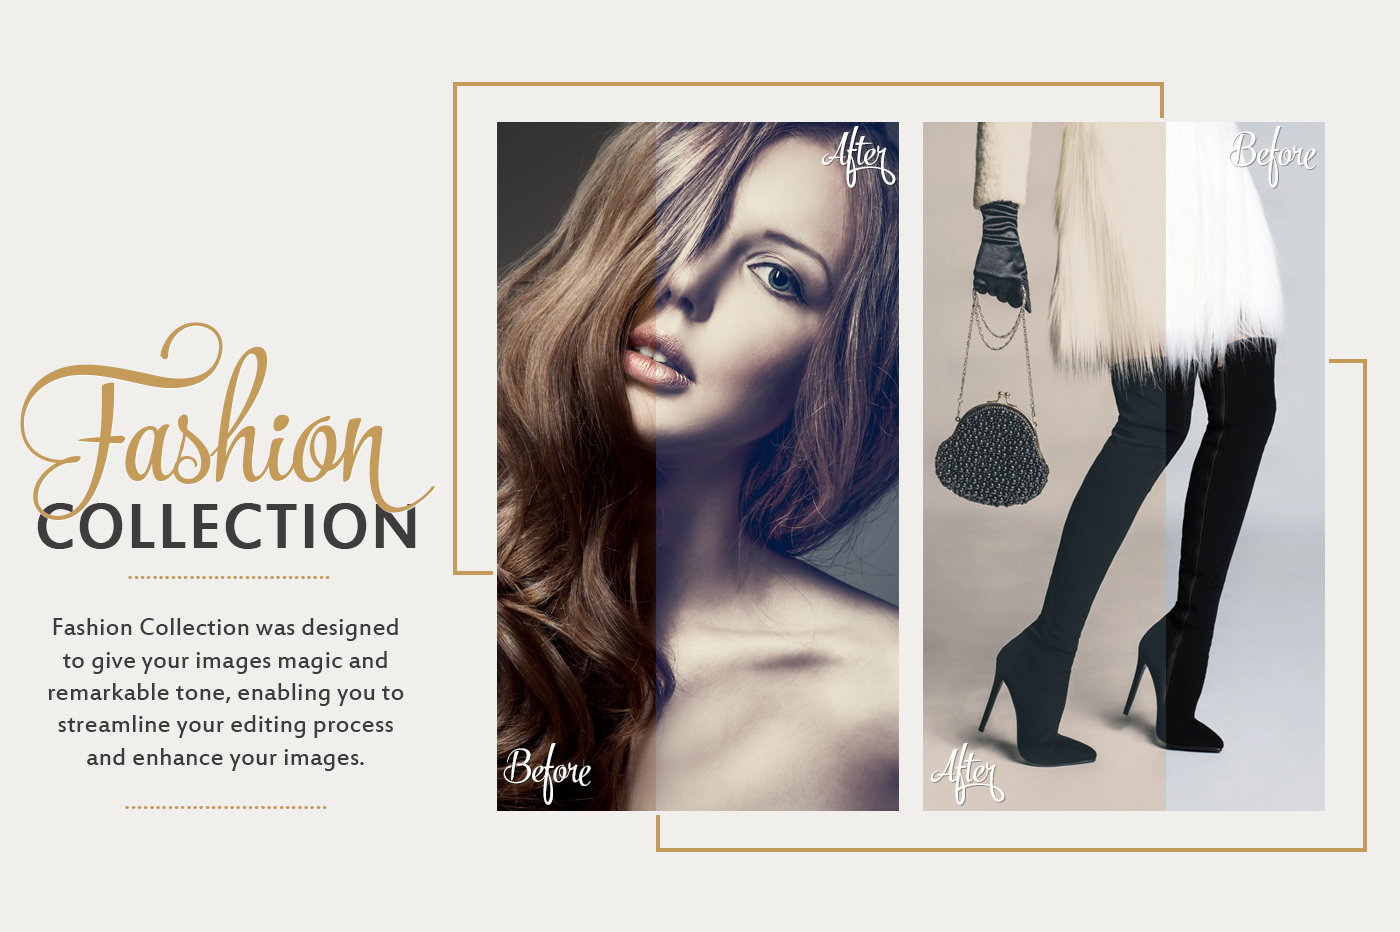 vwin德赢网《时尚设计》,设计设计的设计师,设计了《摄影》